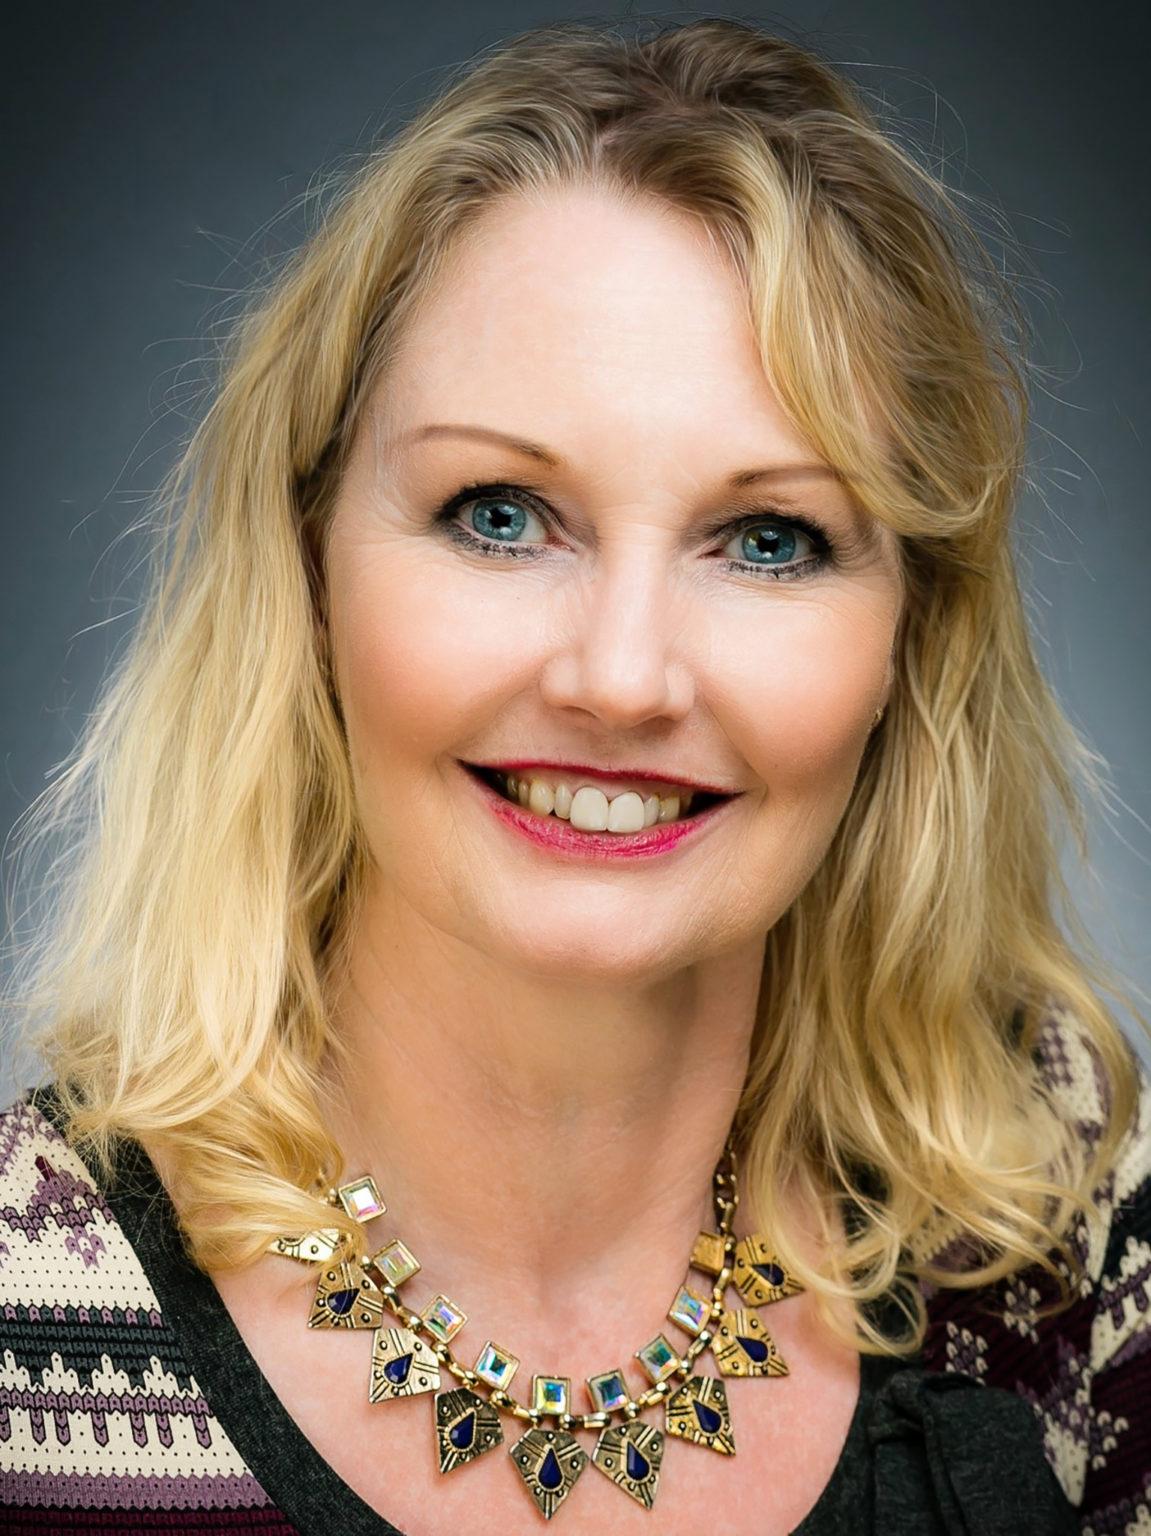 Lincolnshire photographer Sharon Mallinson